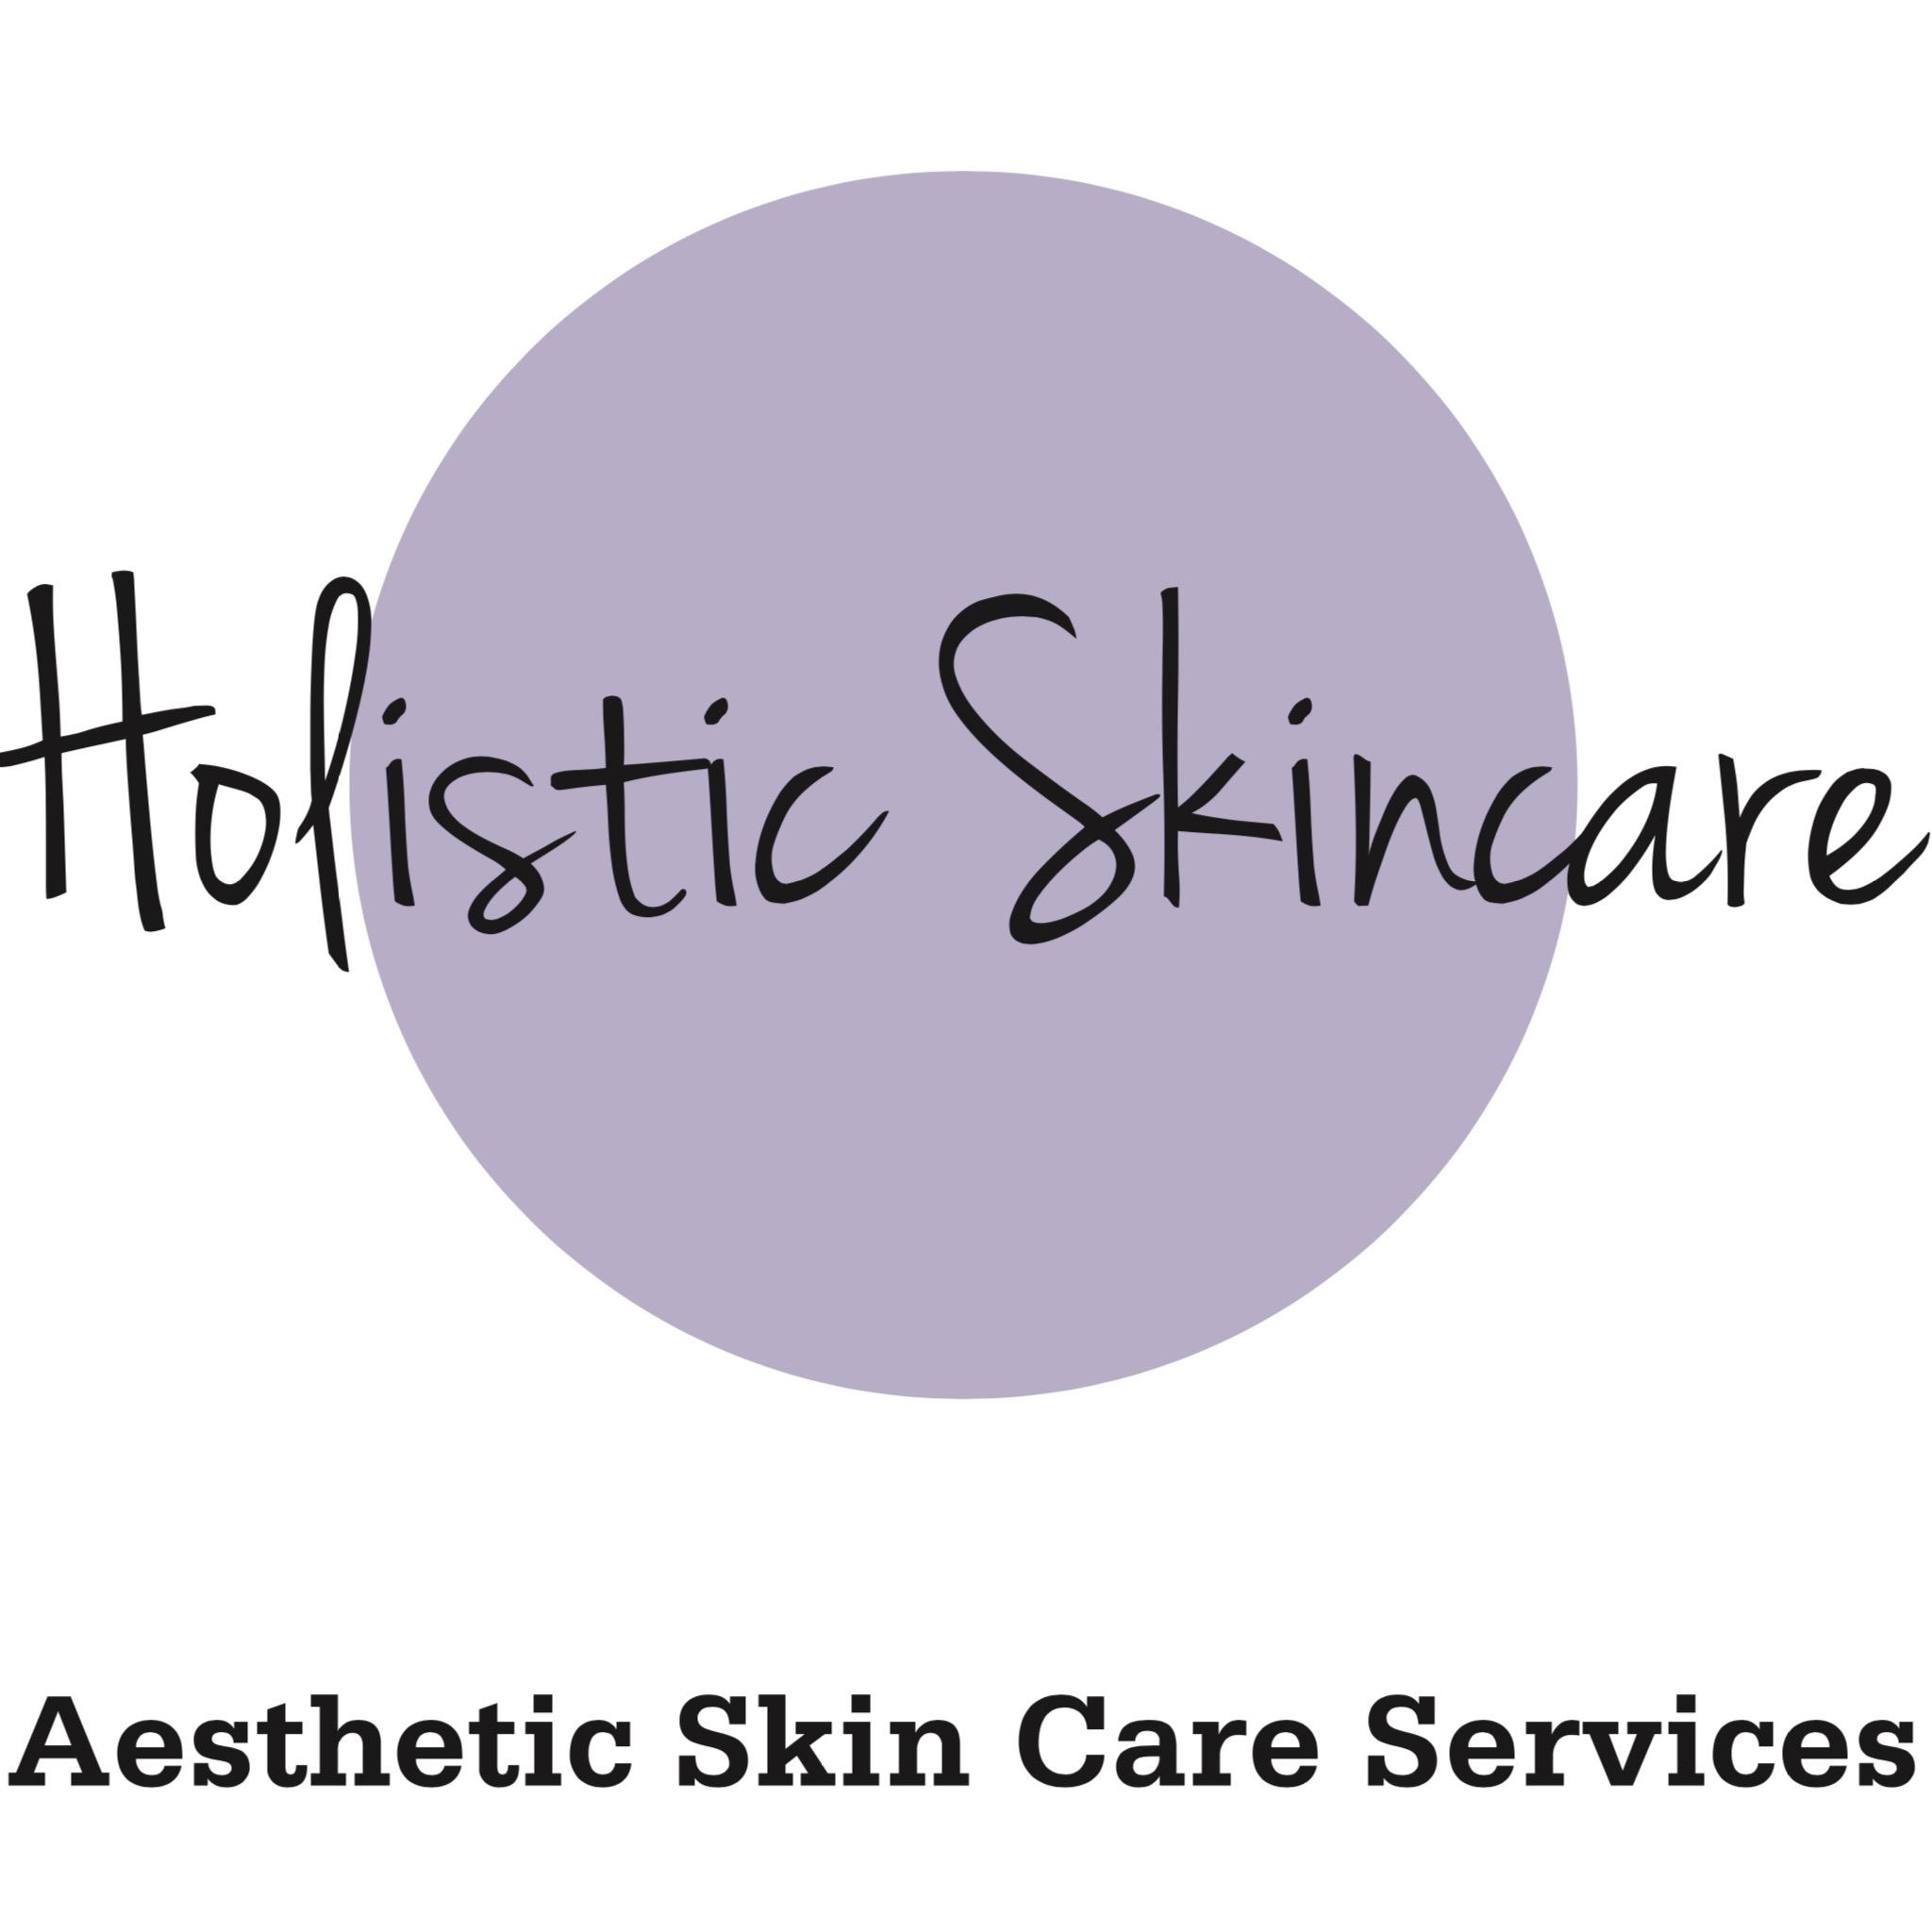 Lisa's Holistic Skincare